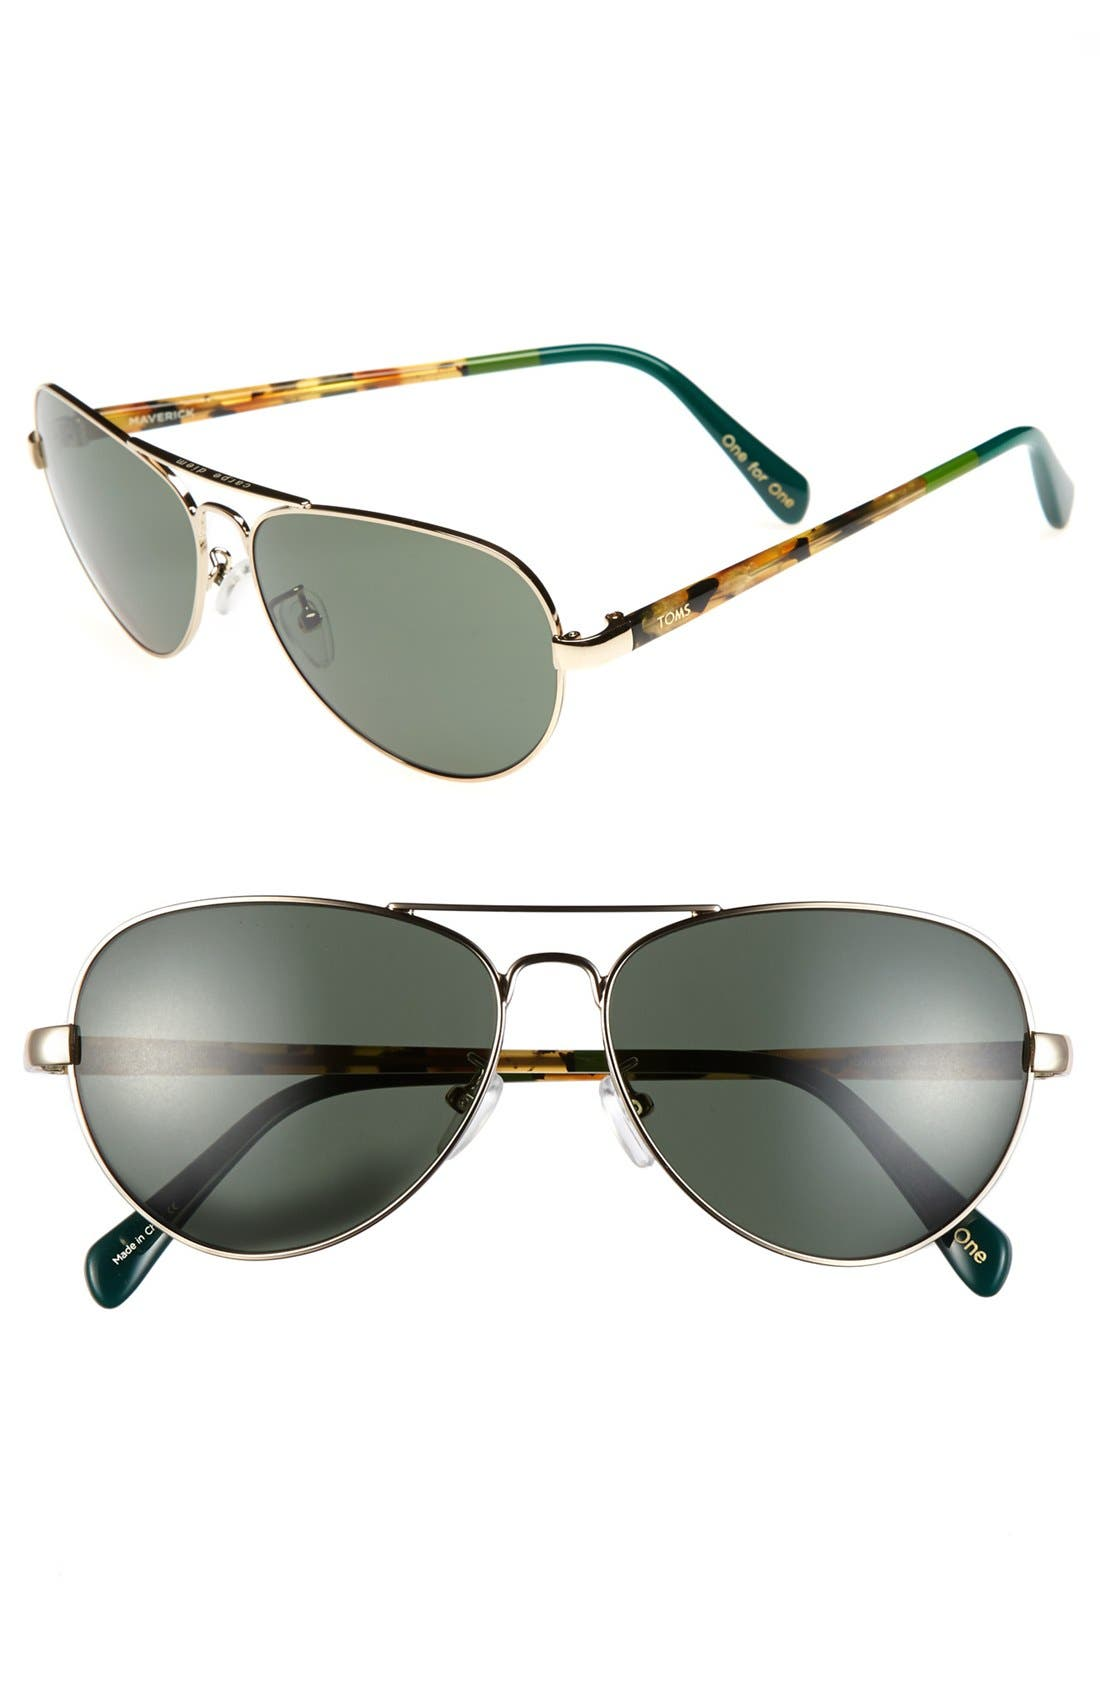 Main Image - TOMS 'Maverick' 60mm Aviator Sunglasses